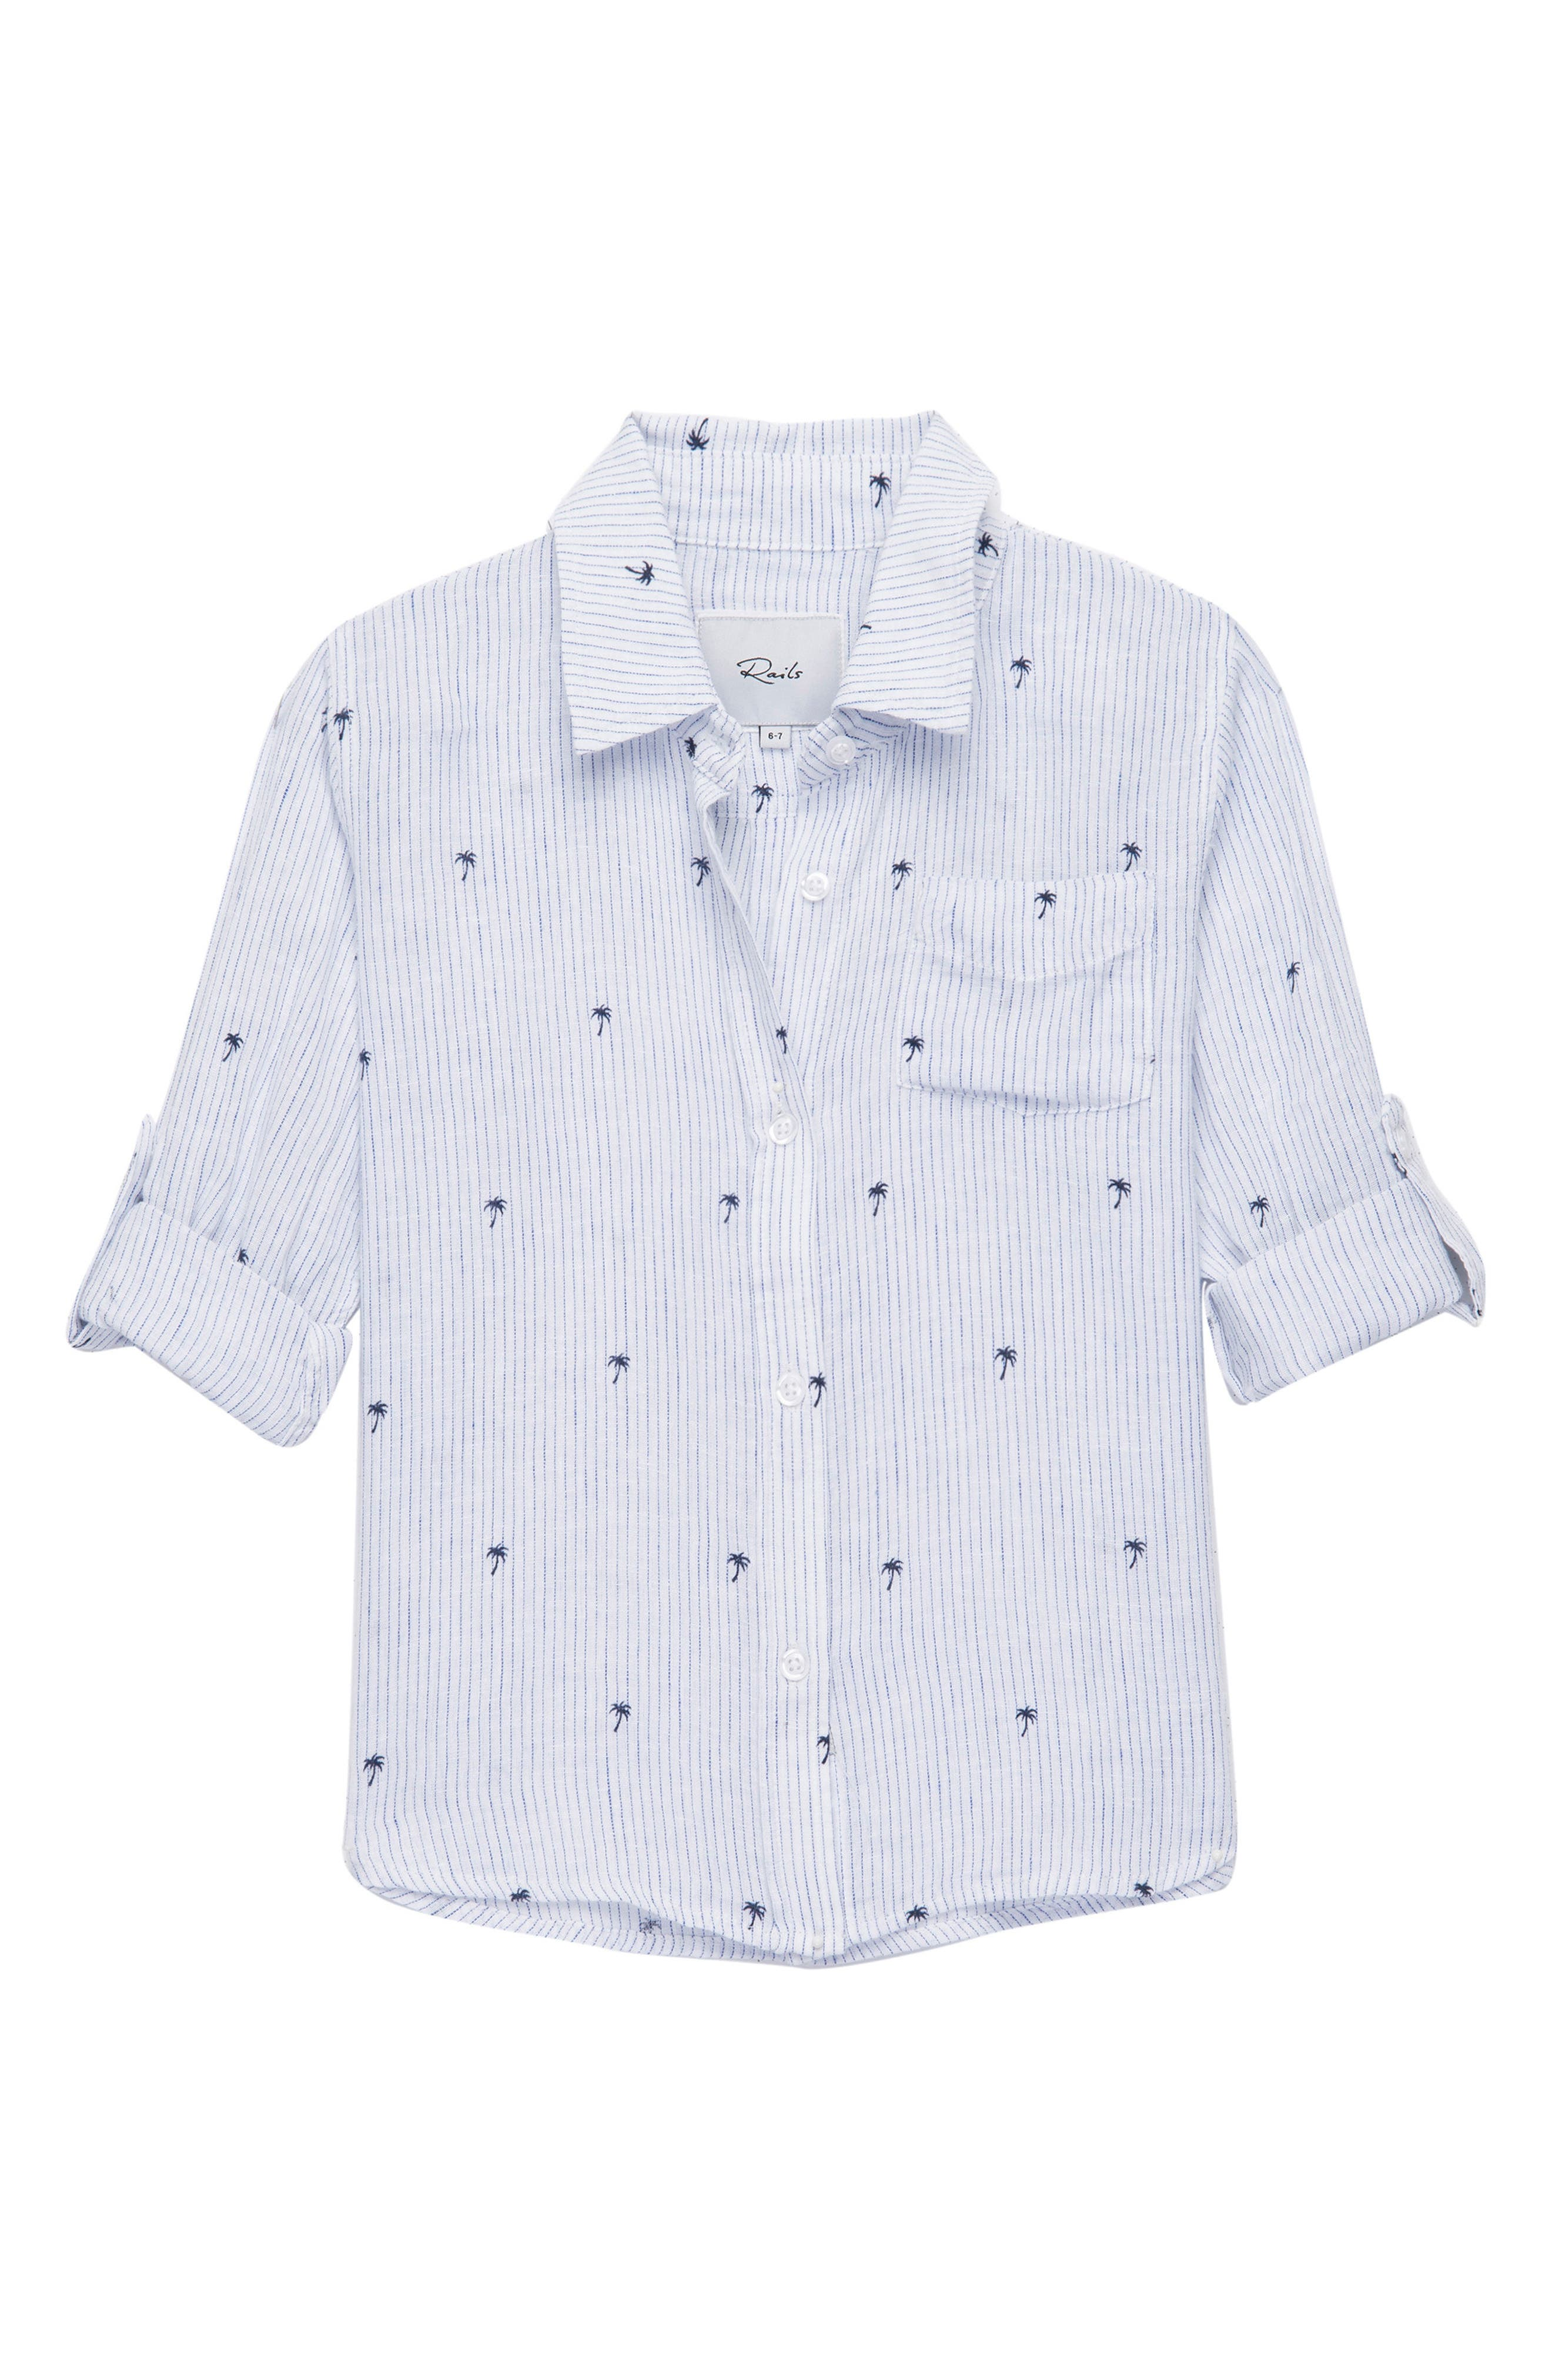 Cora Palm Woven Shirt,                             Main thumbnail 1, color,                             Mini Palms On Royal Stripe